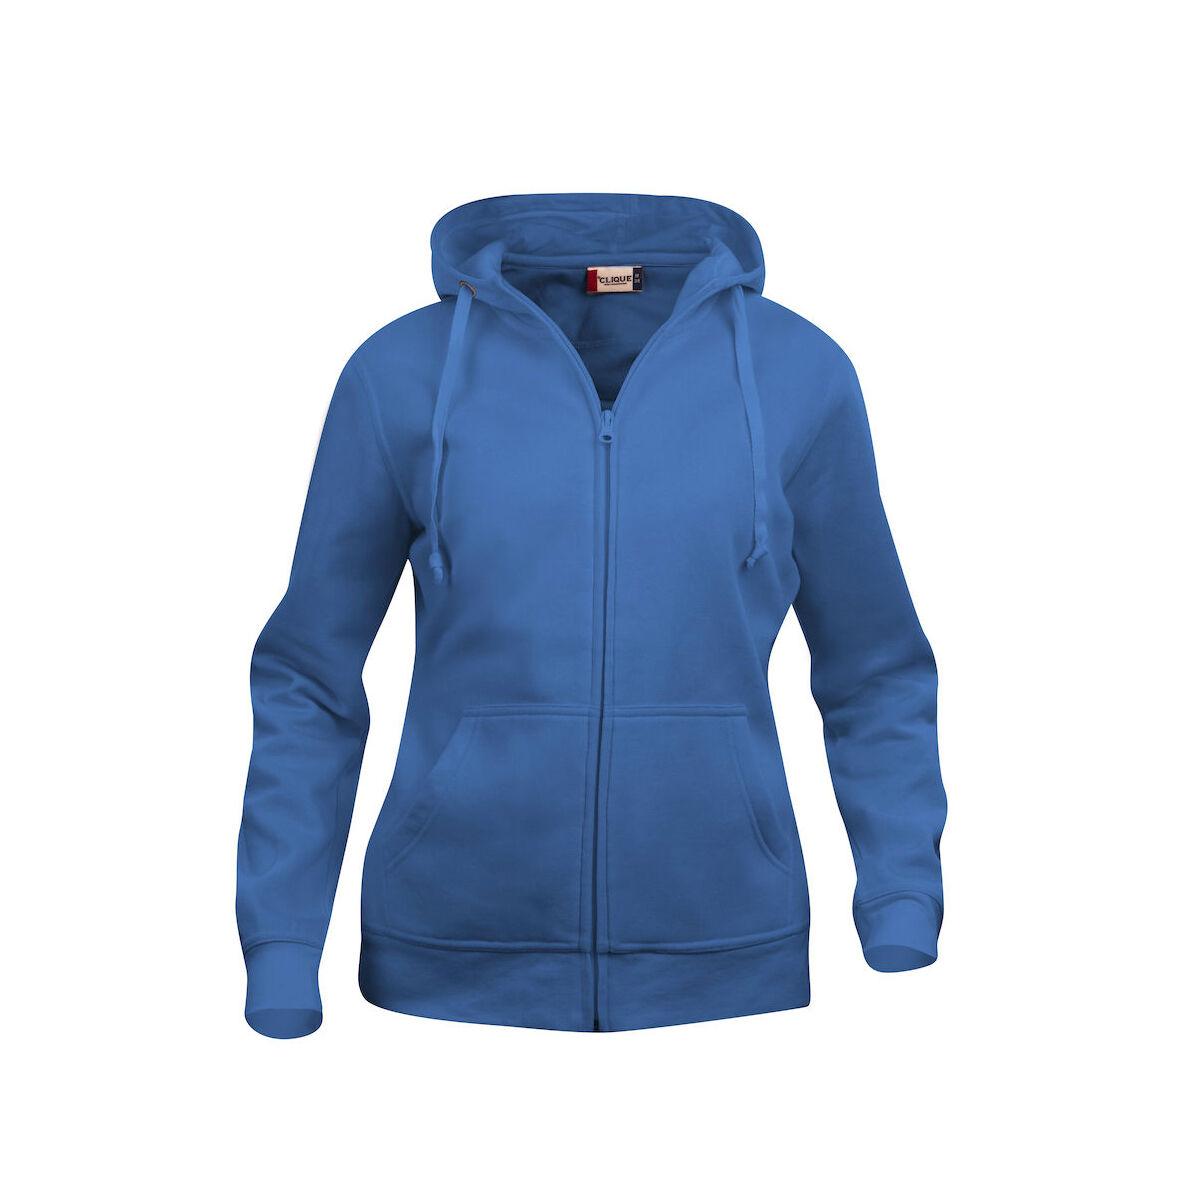 Clique Zip Hoodie (Royal Blue)